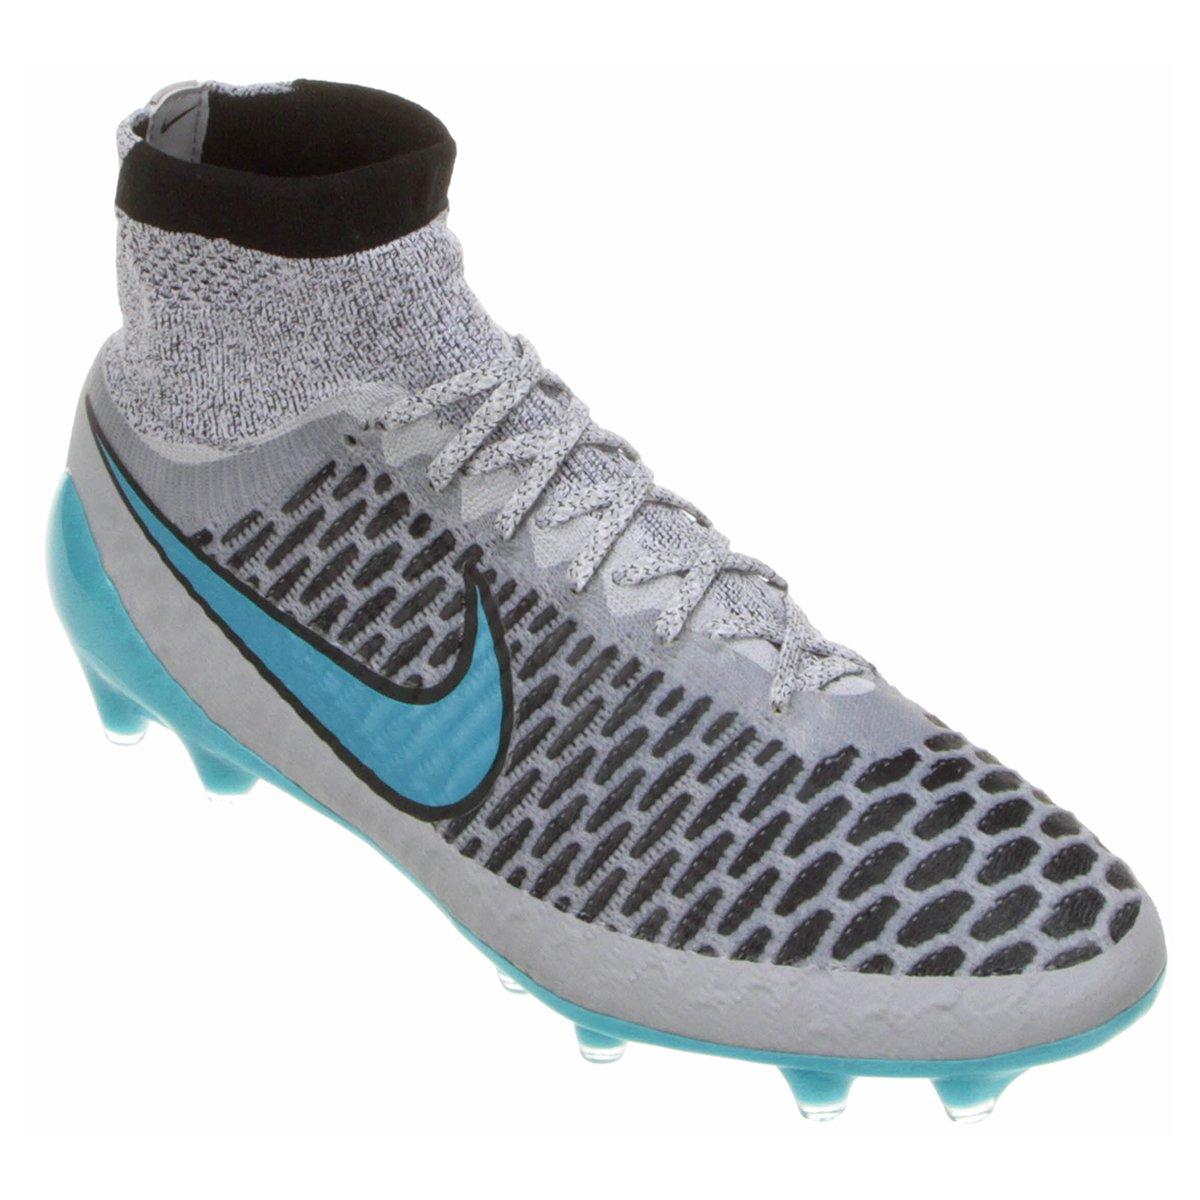 be3785e530 Chuteira Nike Magista Obra FG Campo